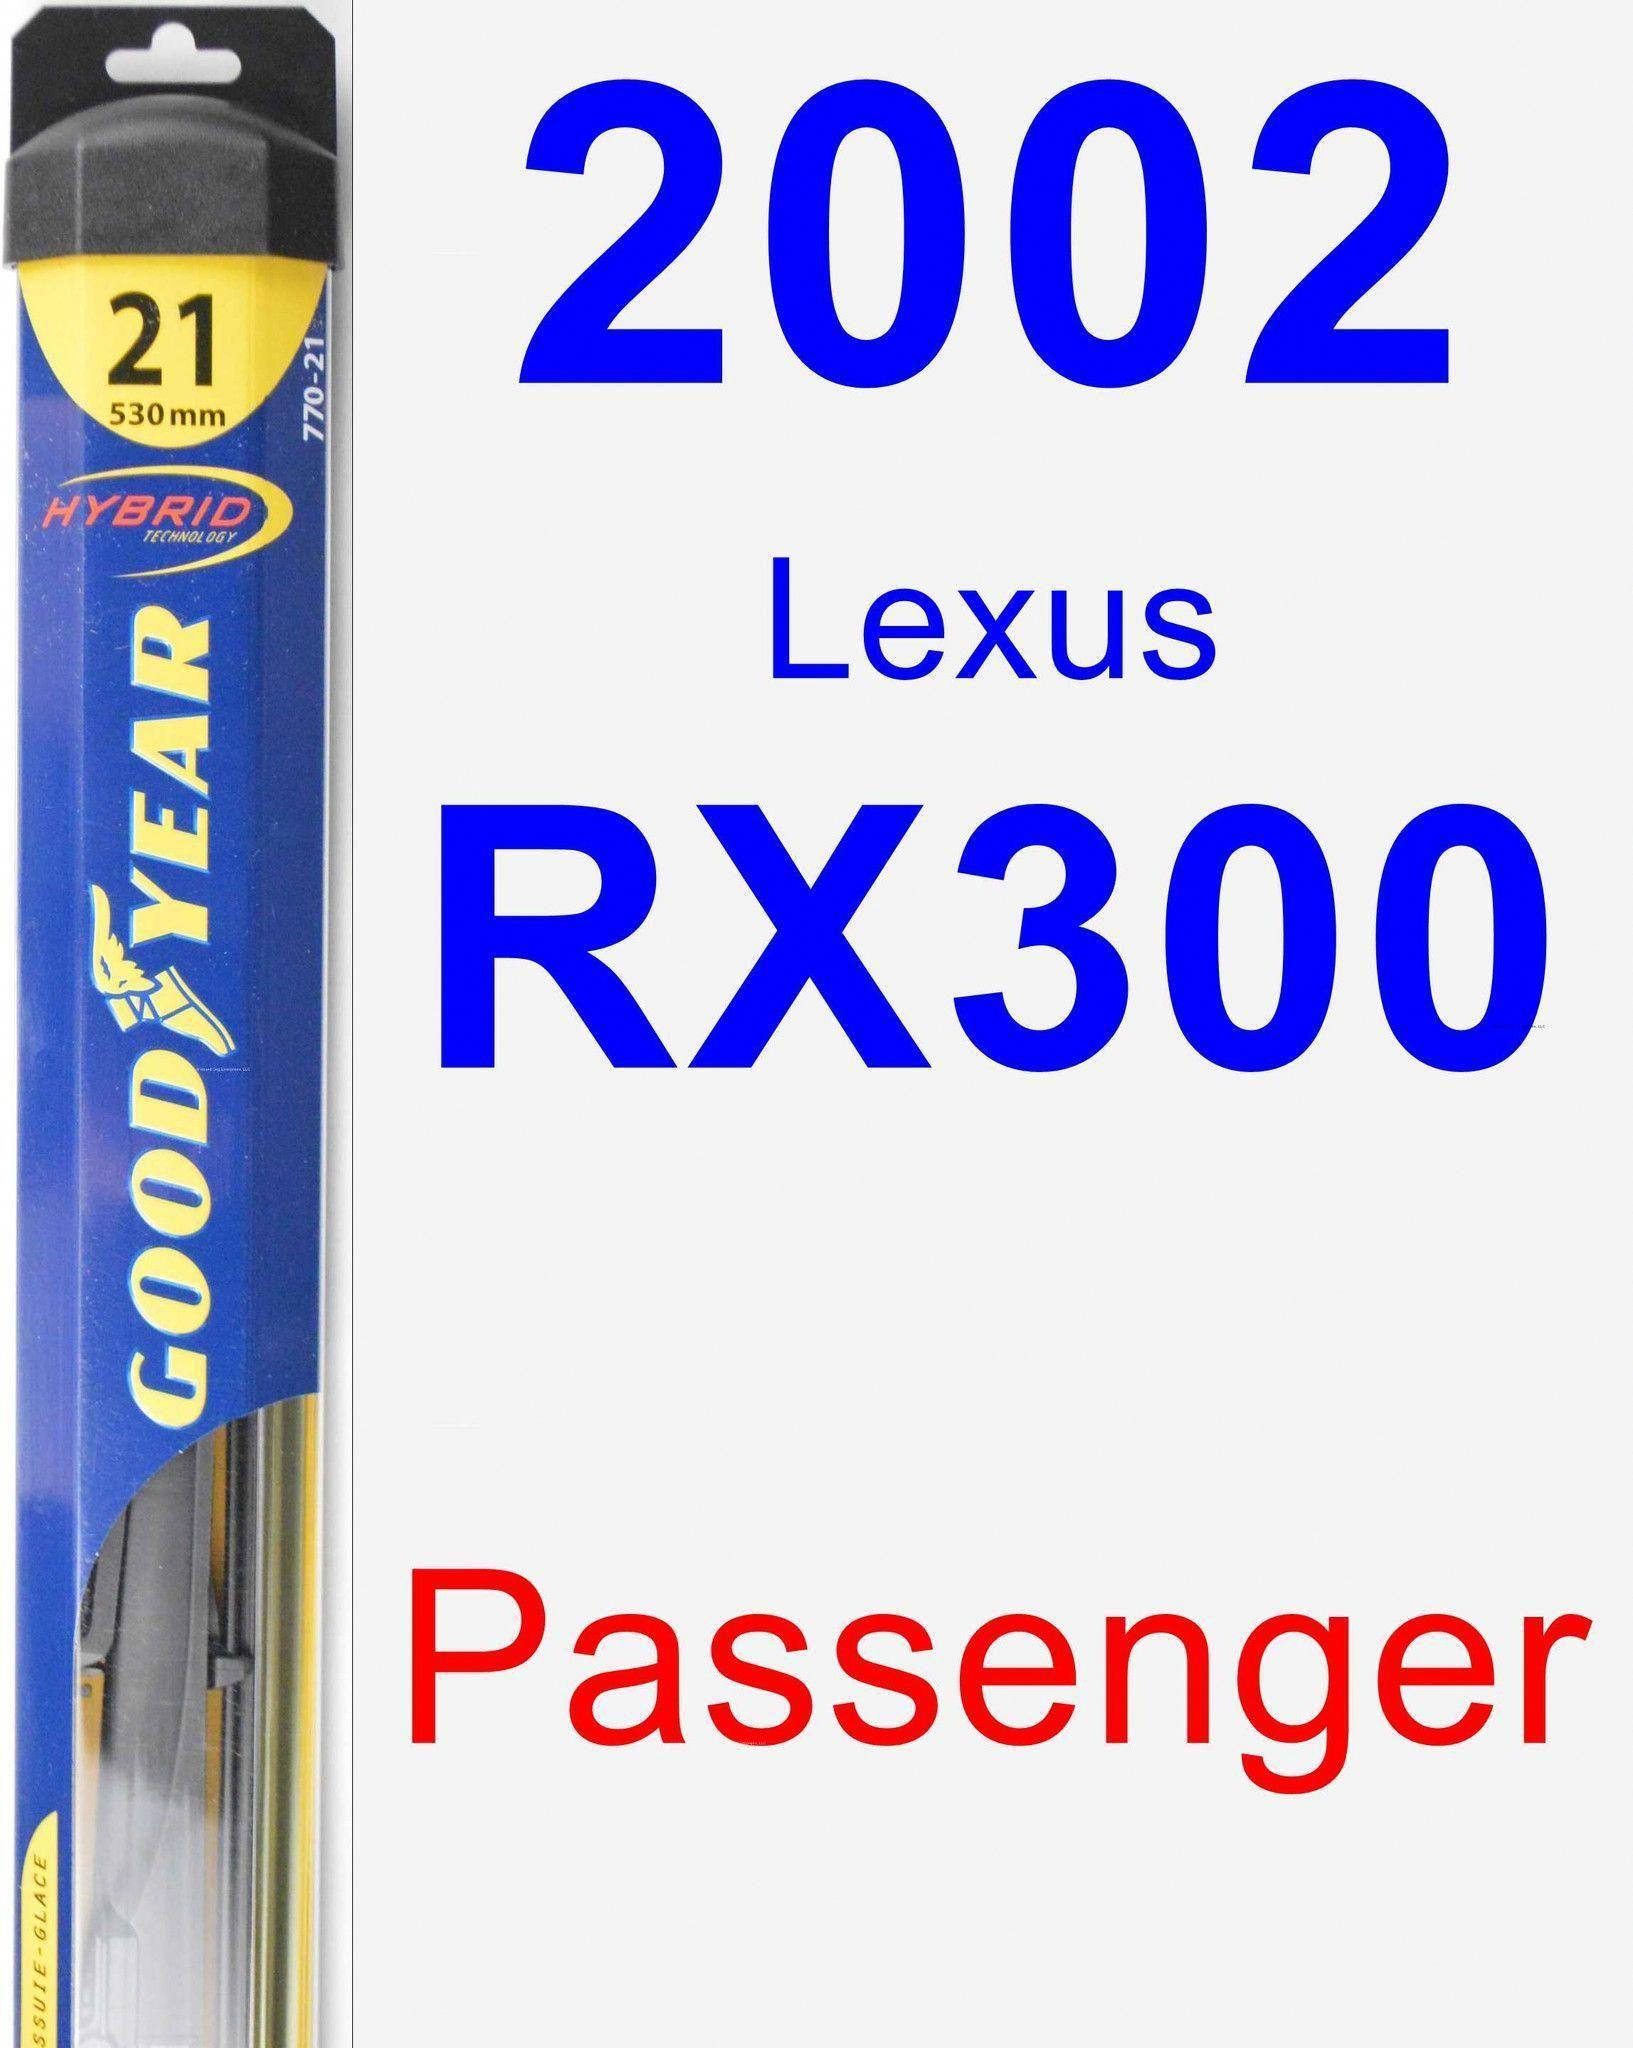 Passenger Wiper Blade for 2002 Lexus RX300 Hybrid